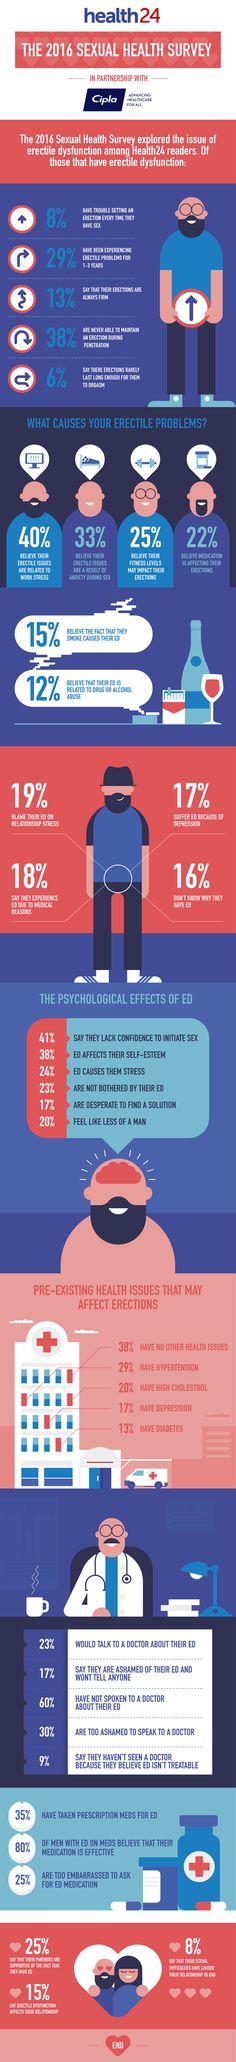 Health 24 infographic on Behance